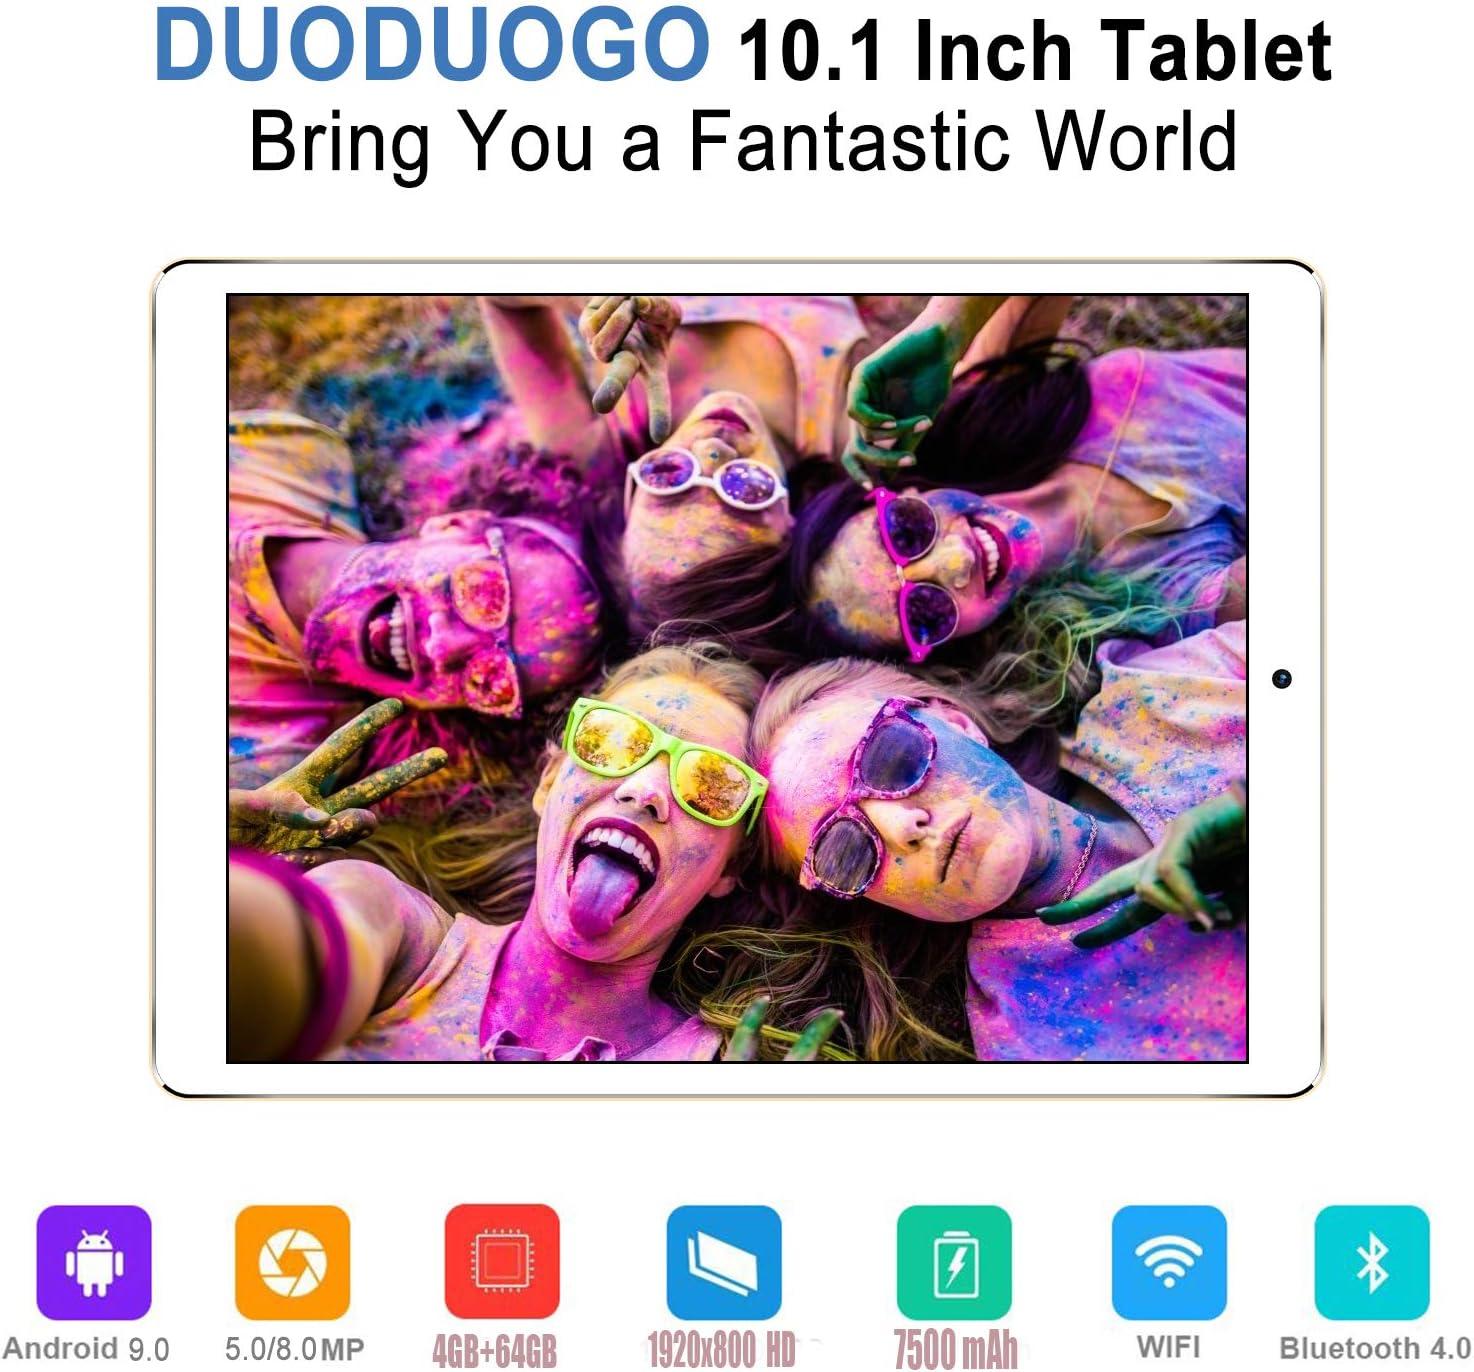 8MP C/ámara Tableta Rat/ón y Teclado 7500mAh Bater/ía 5MP Nergo Tablets PC 4GB RAM+64GB ROM Tres Ranuras: 1xMicroSD + 2xSIM Tablet 10 Pulgadas 4G Android 9.0 +